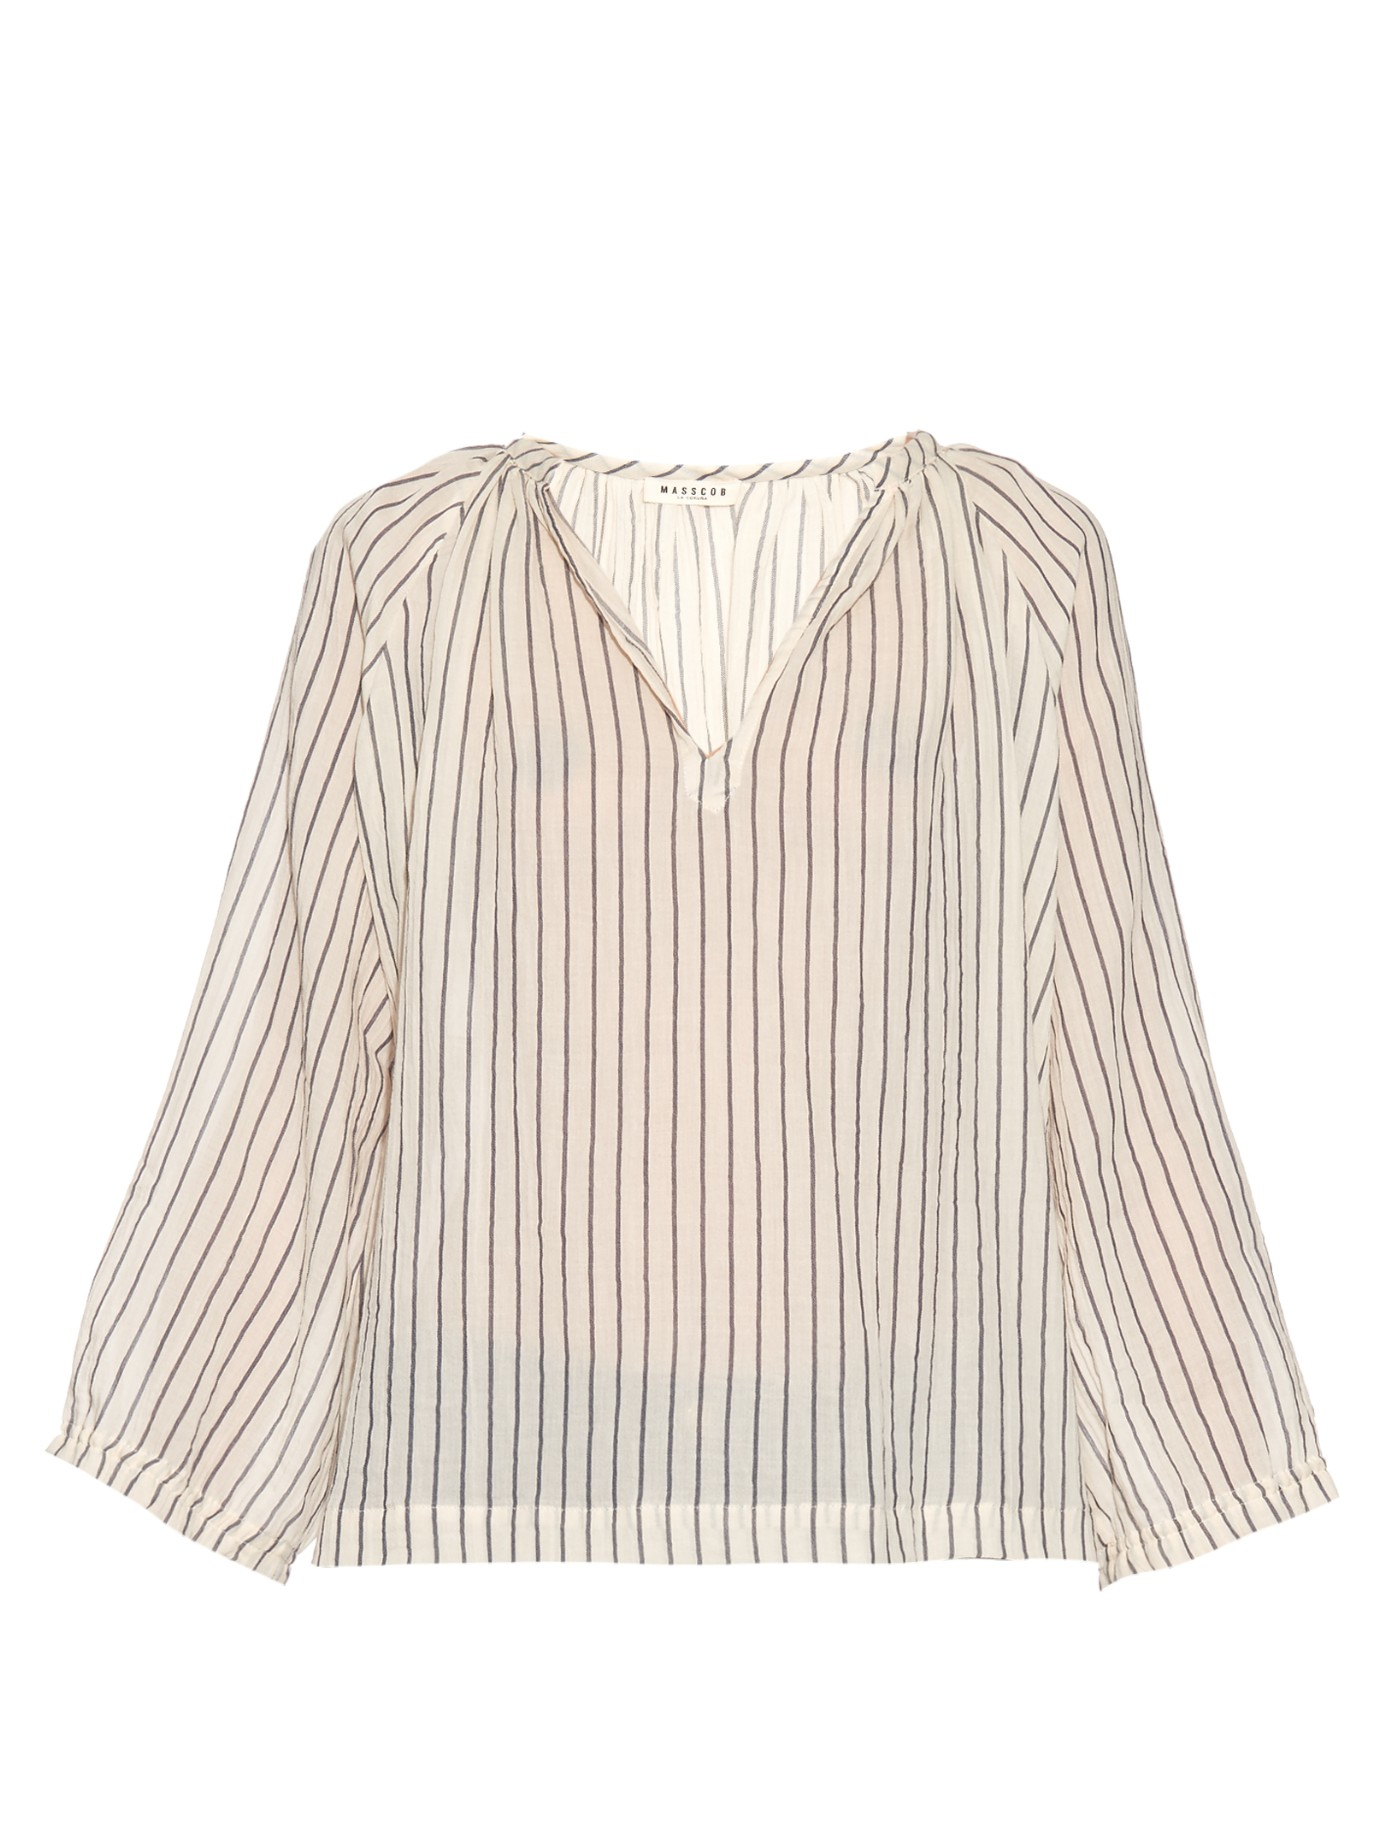 SHIRTS - Shirts Masscob Buy Cheap Finishline 7mzaPIE